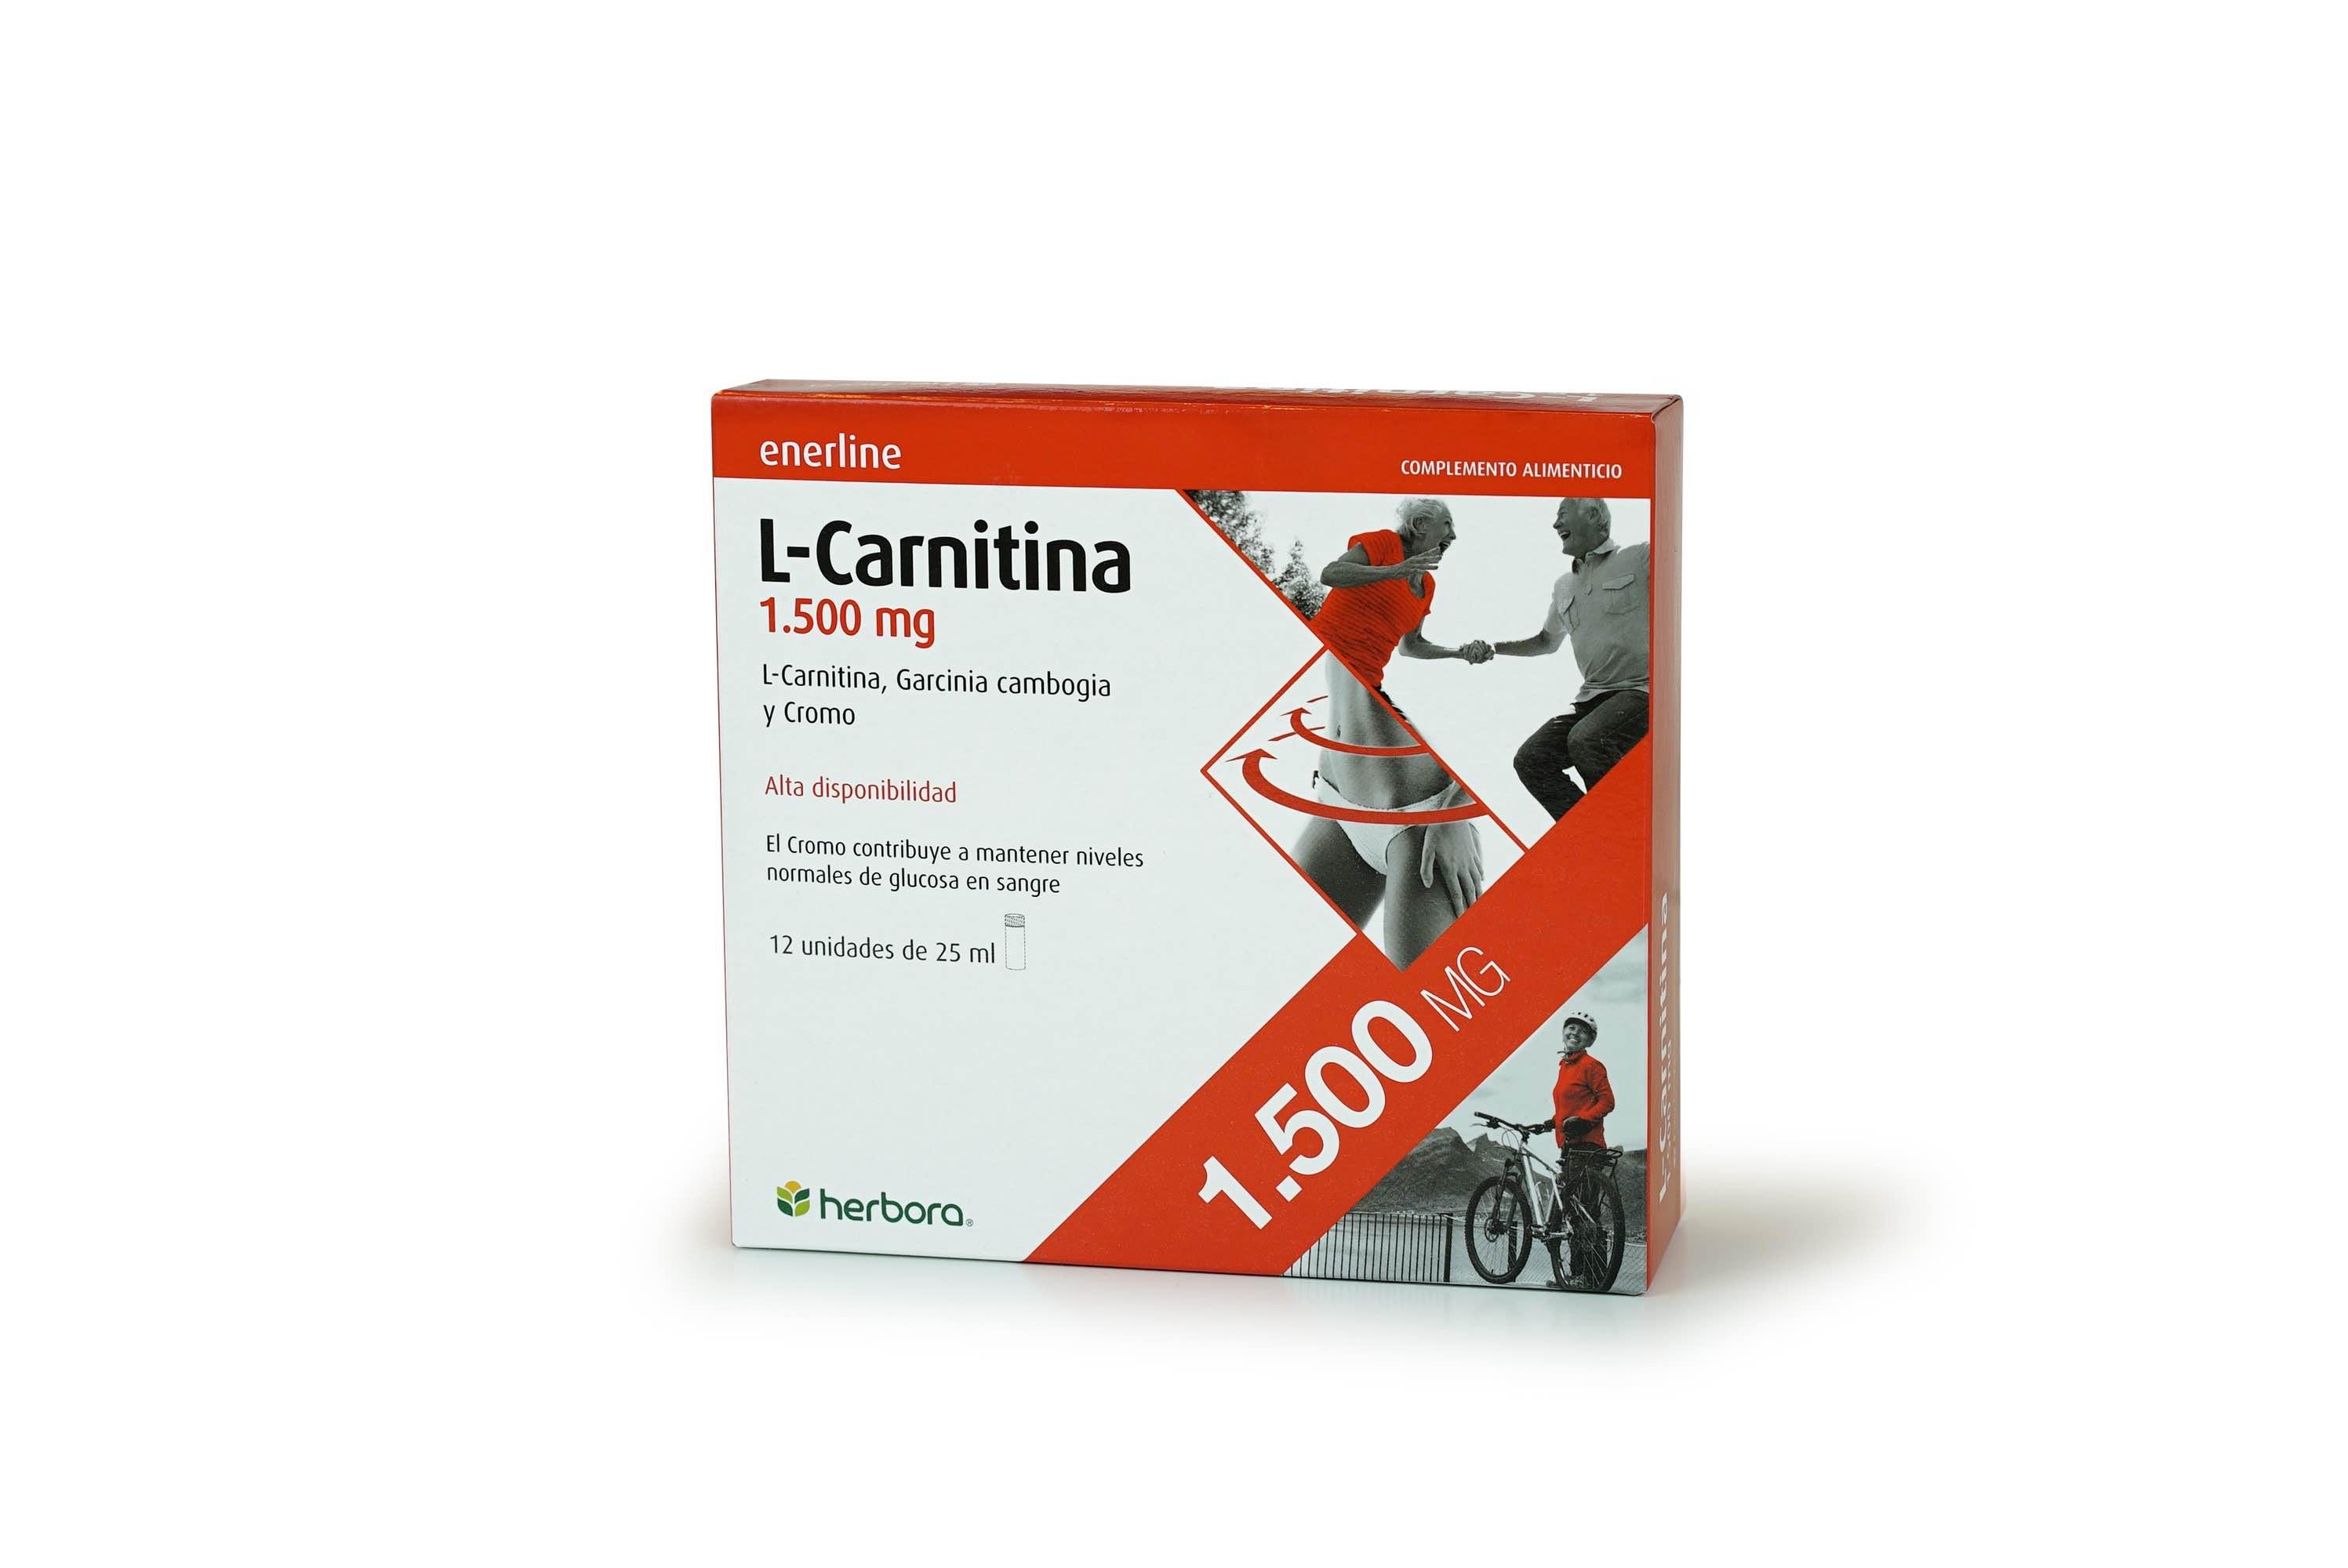 Enerline Carnitina 1500 mg